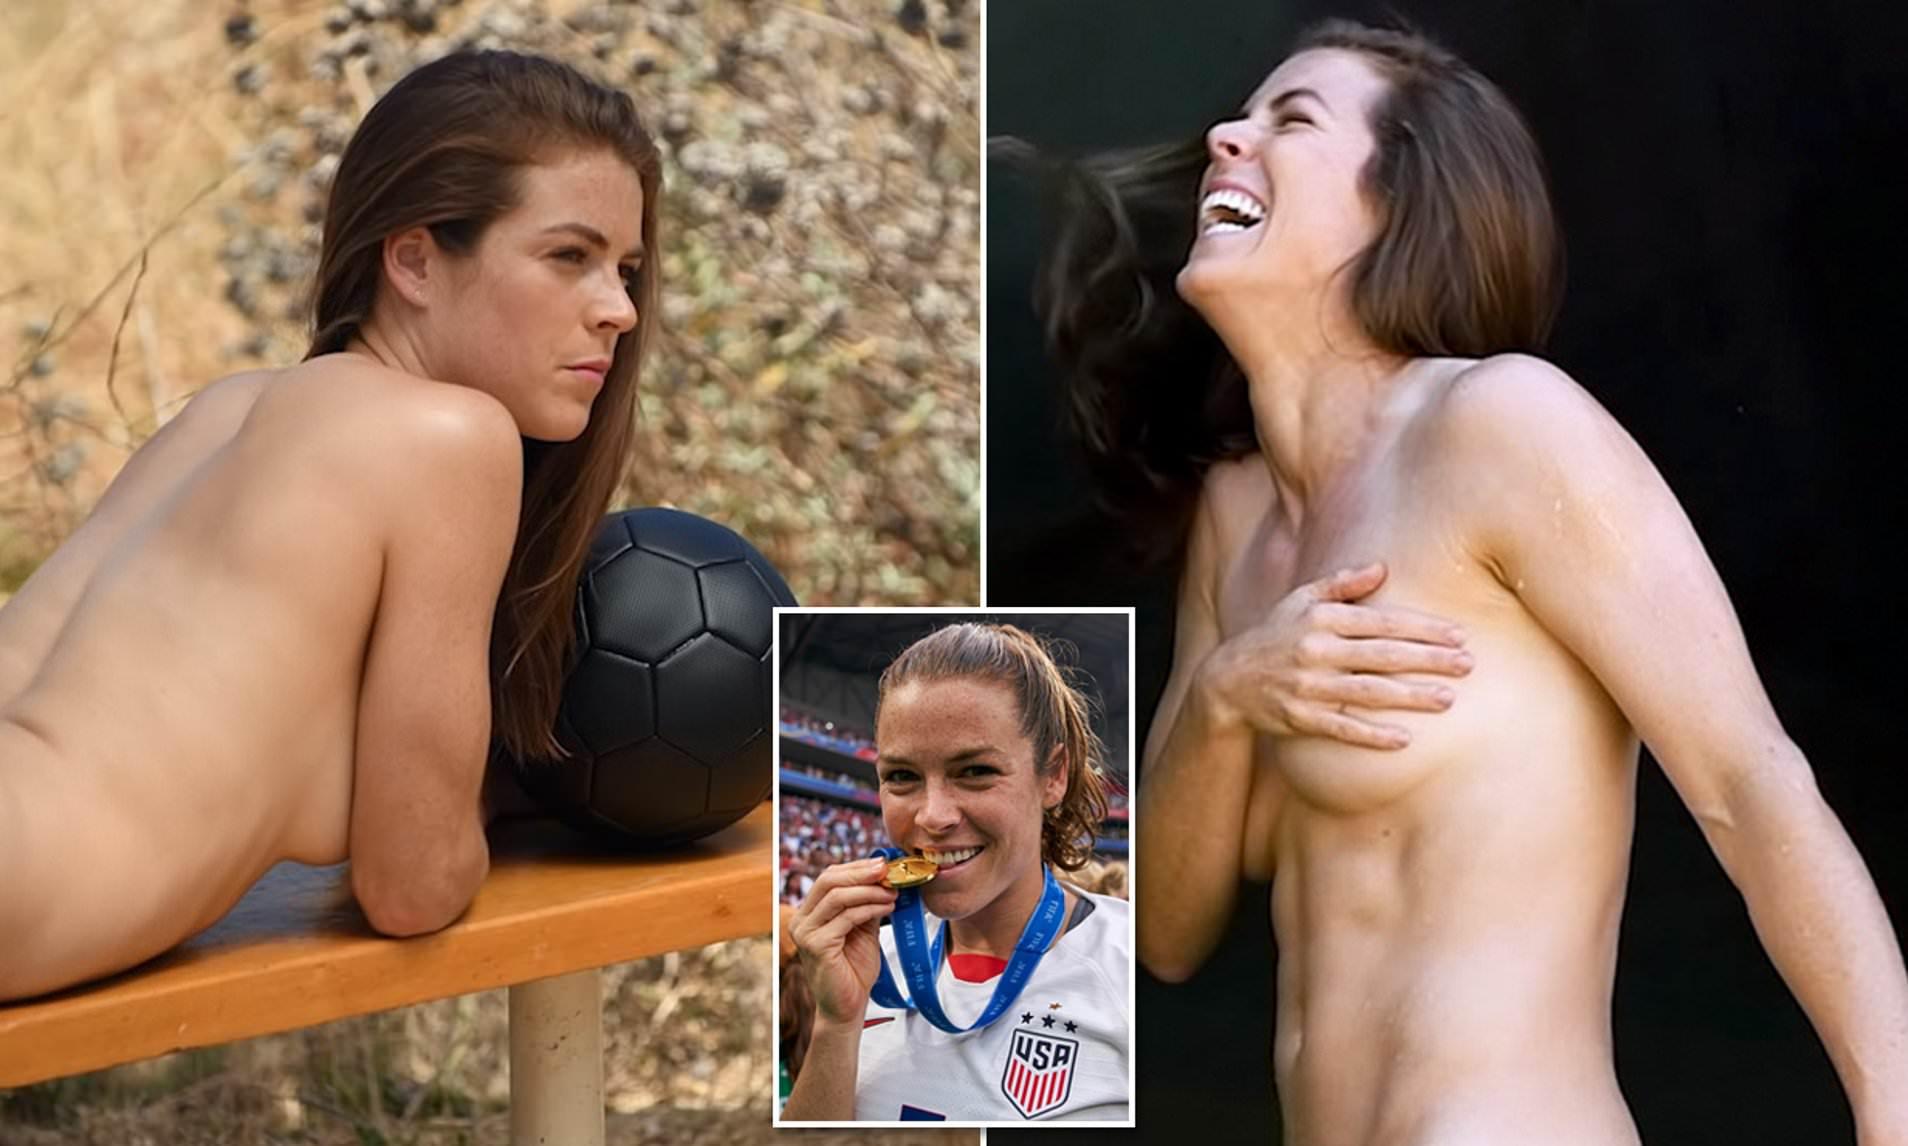 Nude photos of soccer stars